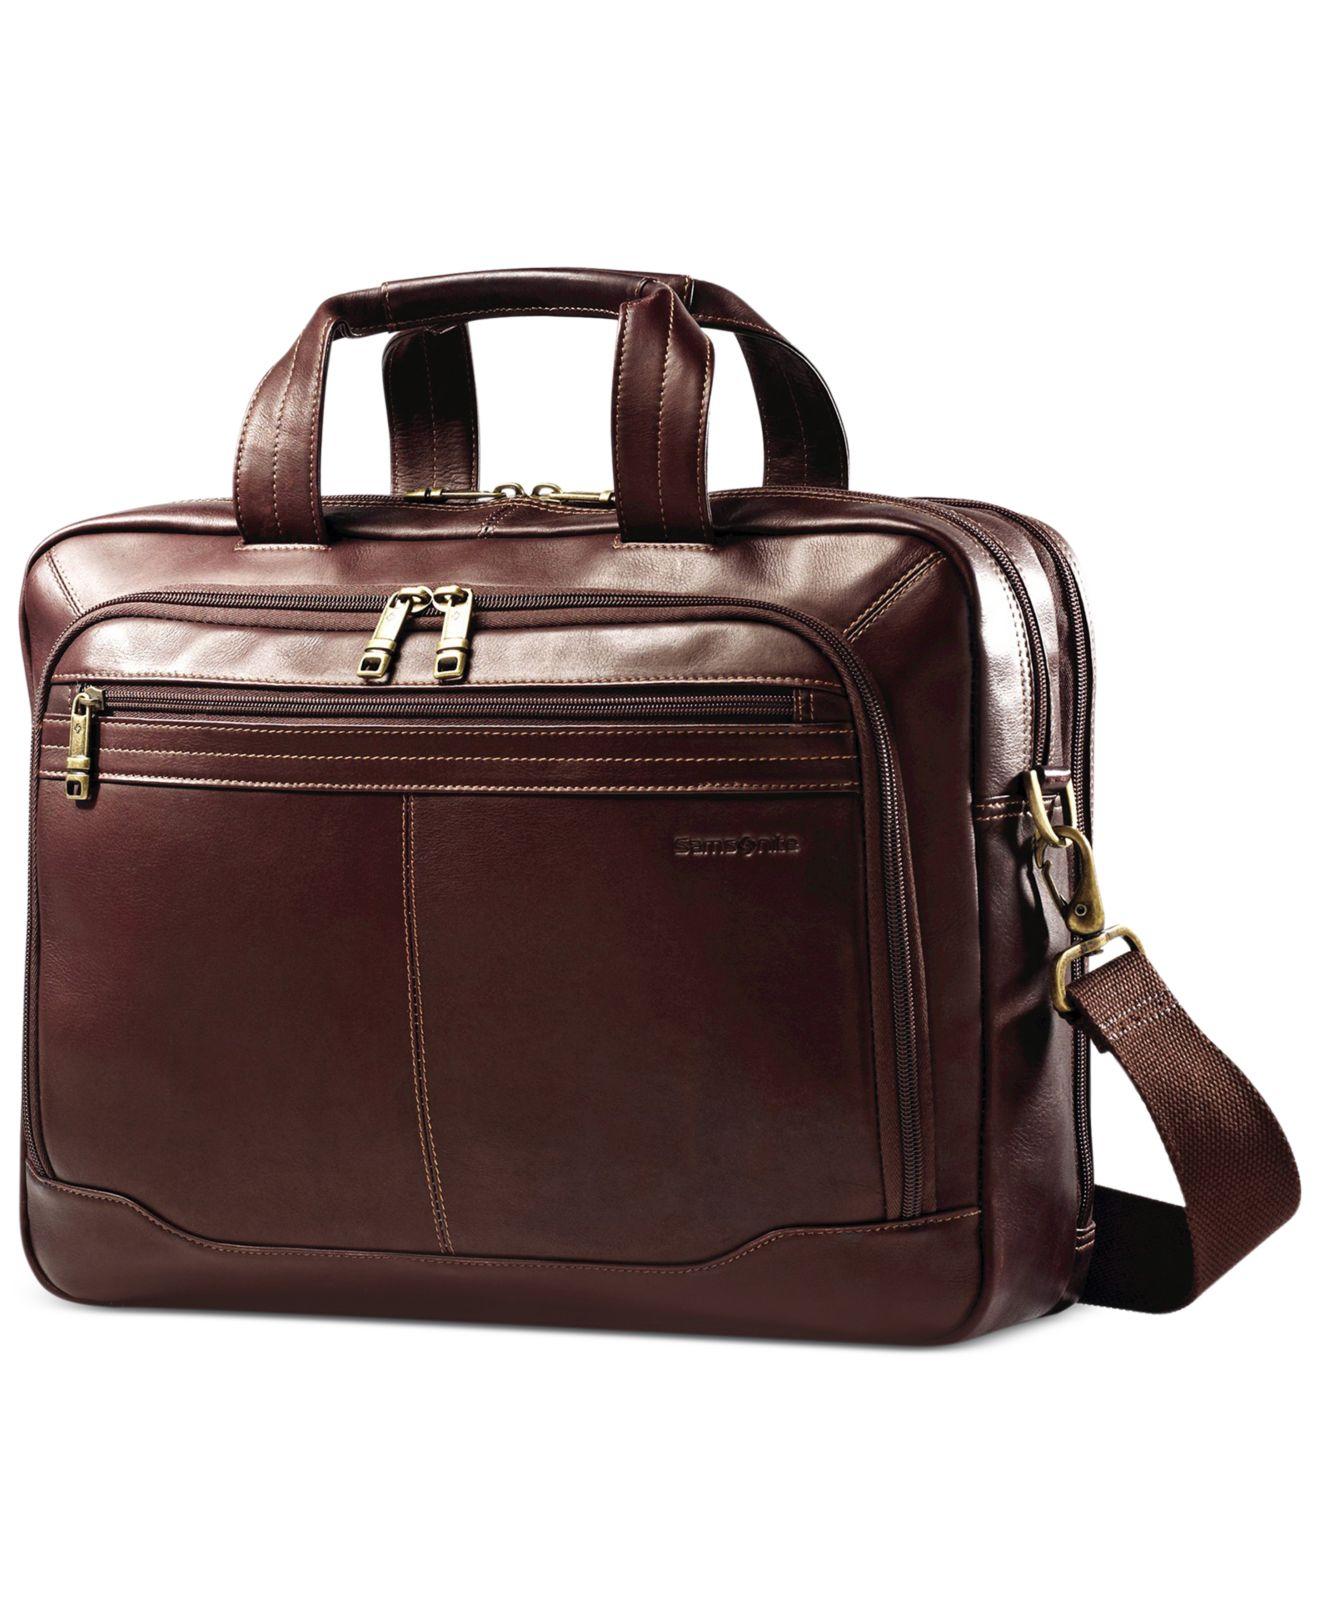 Samsonite Women'S Business Laptop Shoulder Bag 97